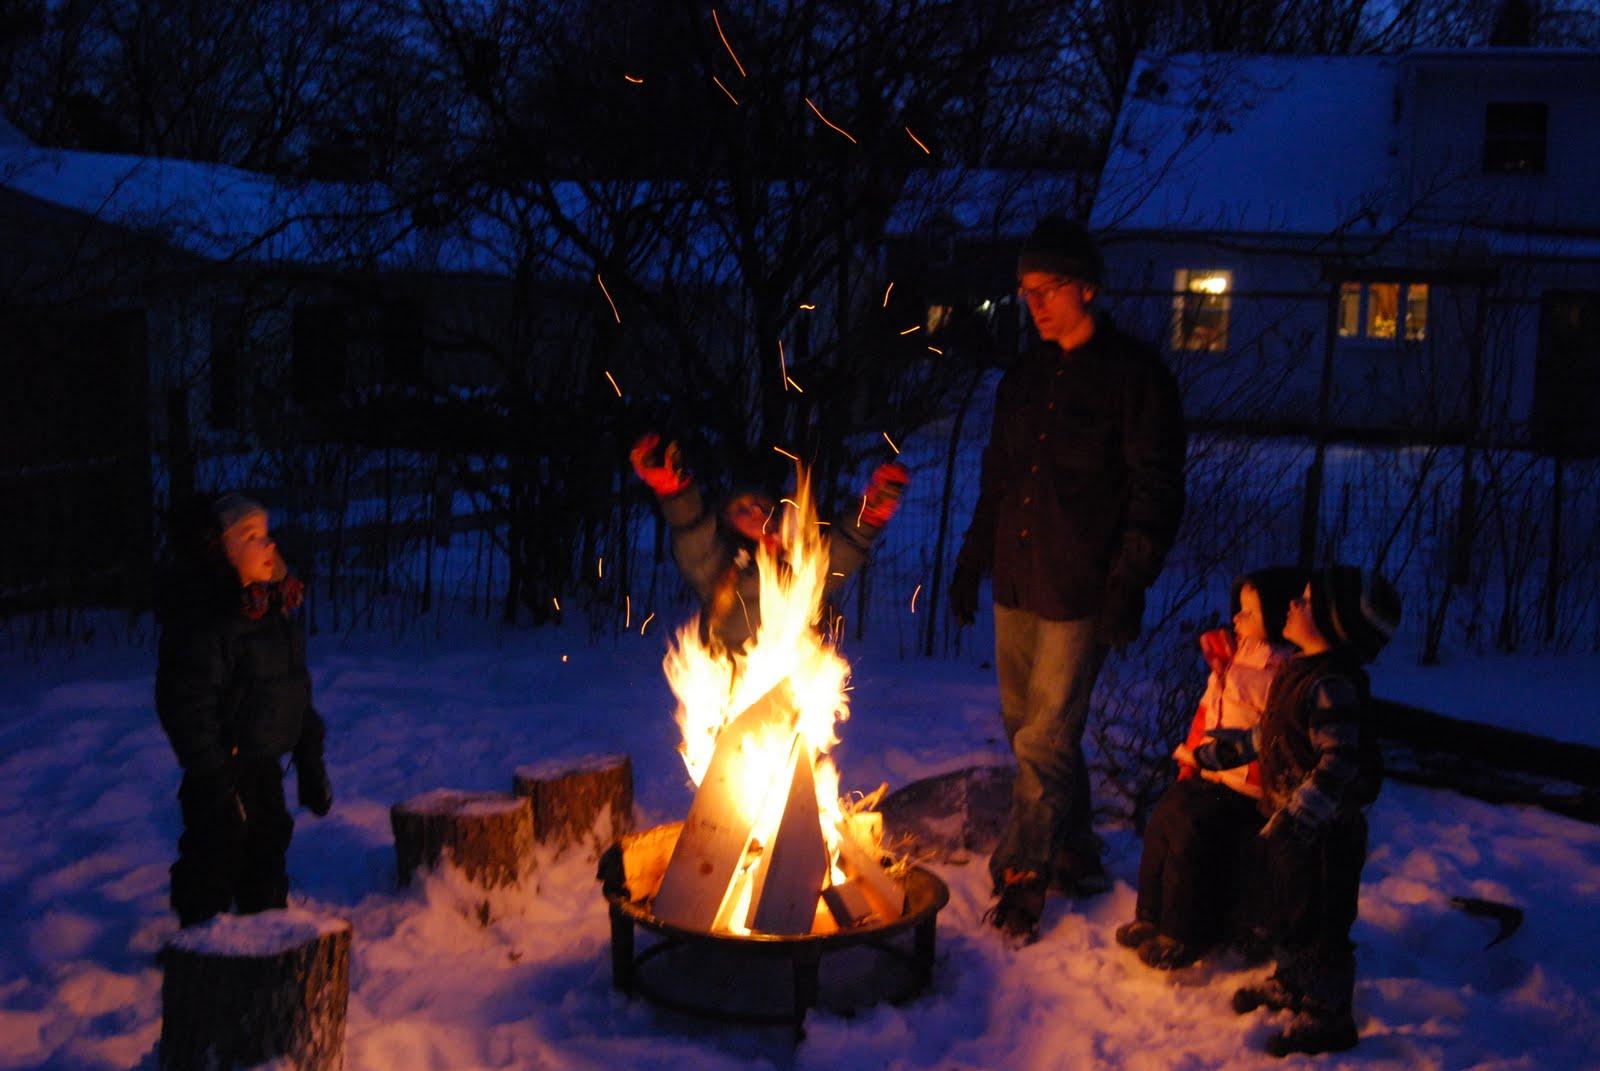 sfmangos winter fire. Black Bedroom Furniture Sets. Home Design Ideas